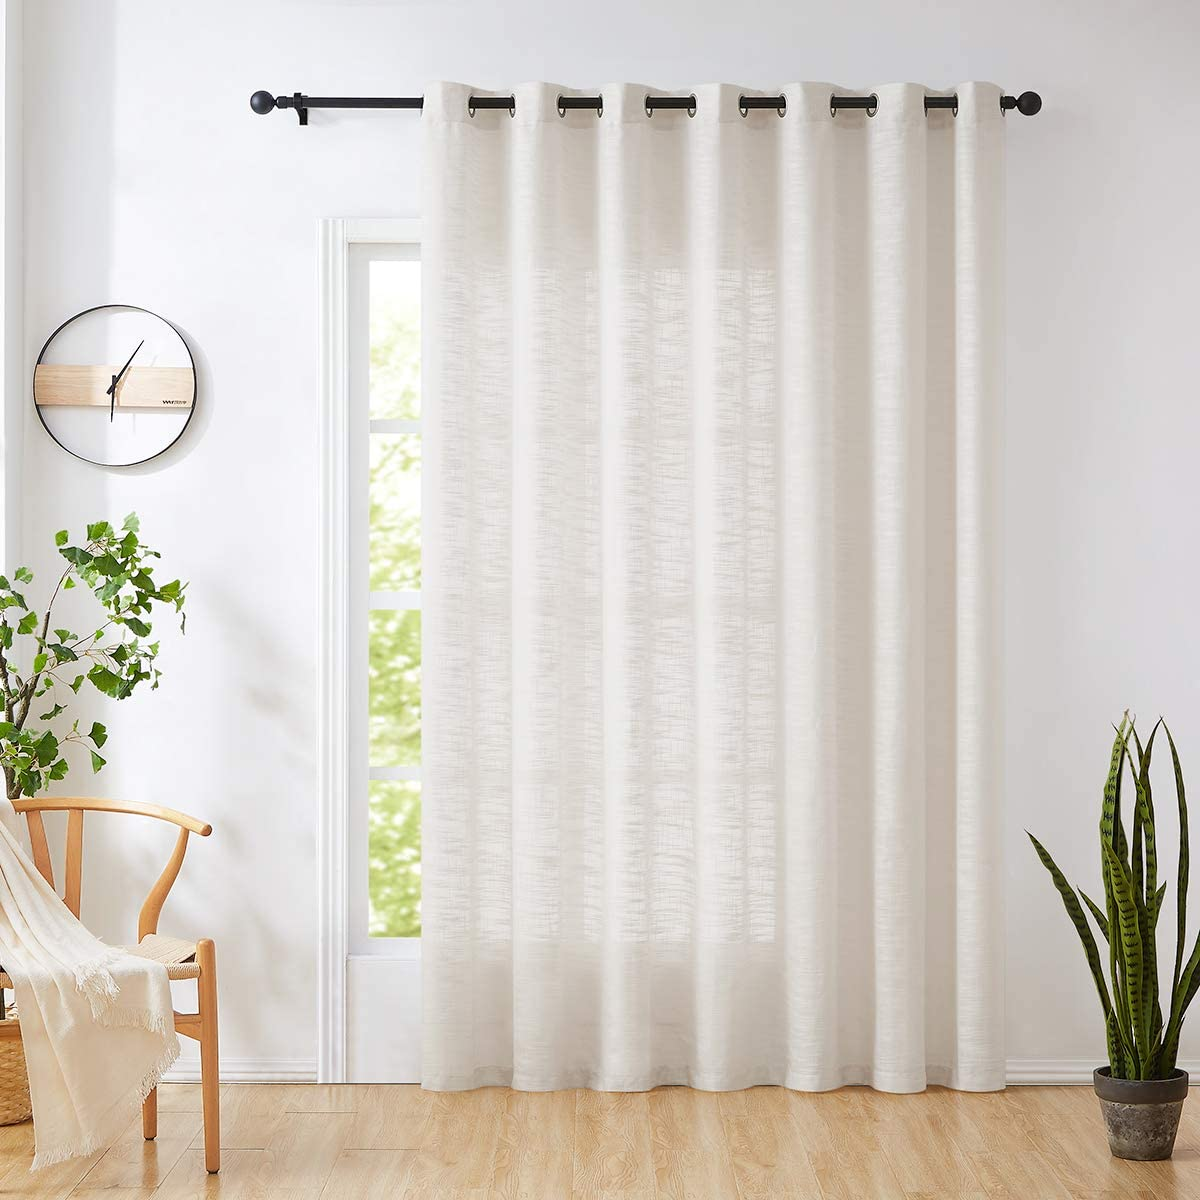 custom curtains for sliding door